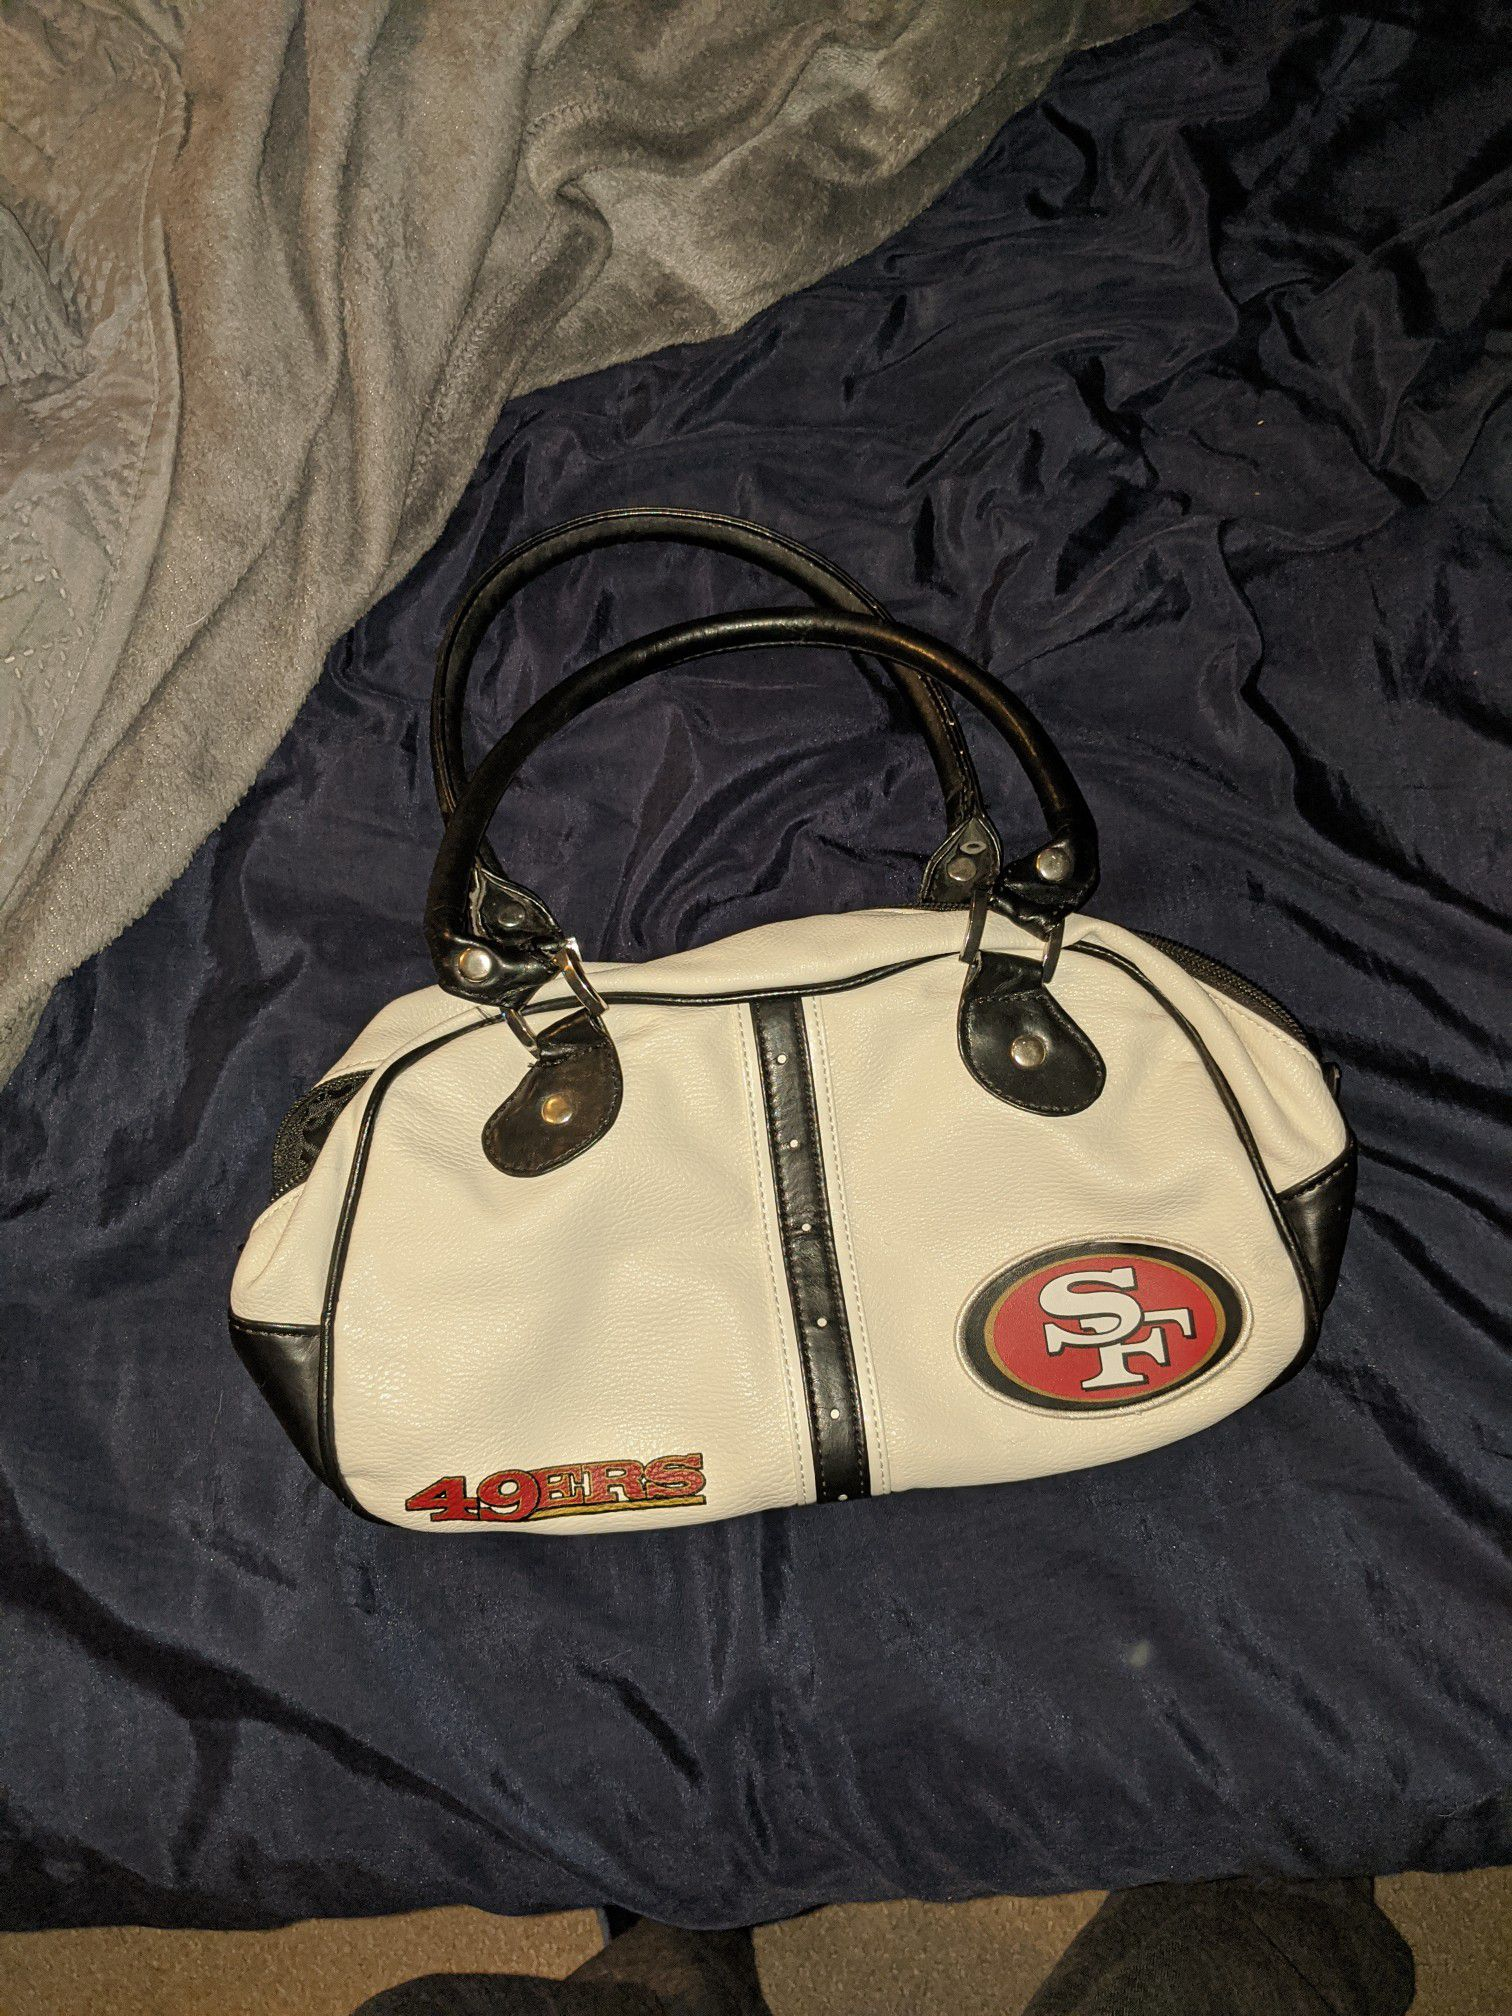 49er purse